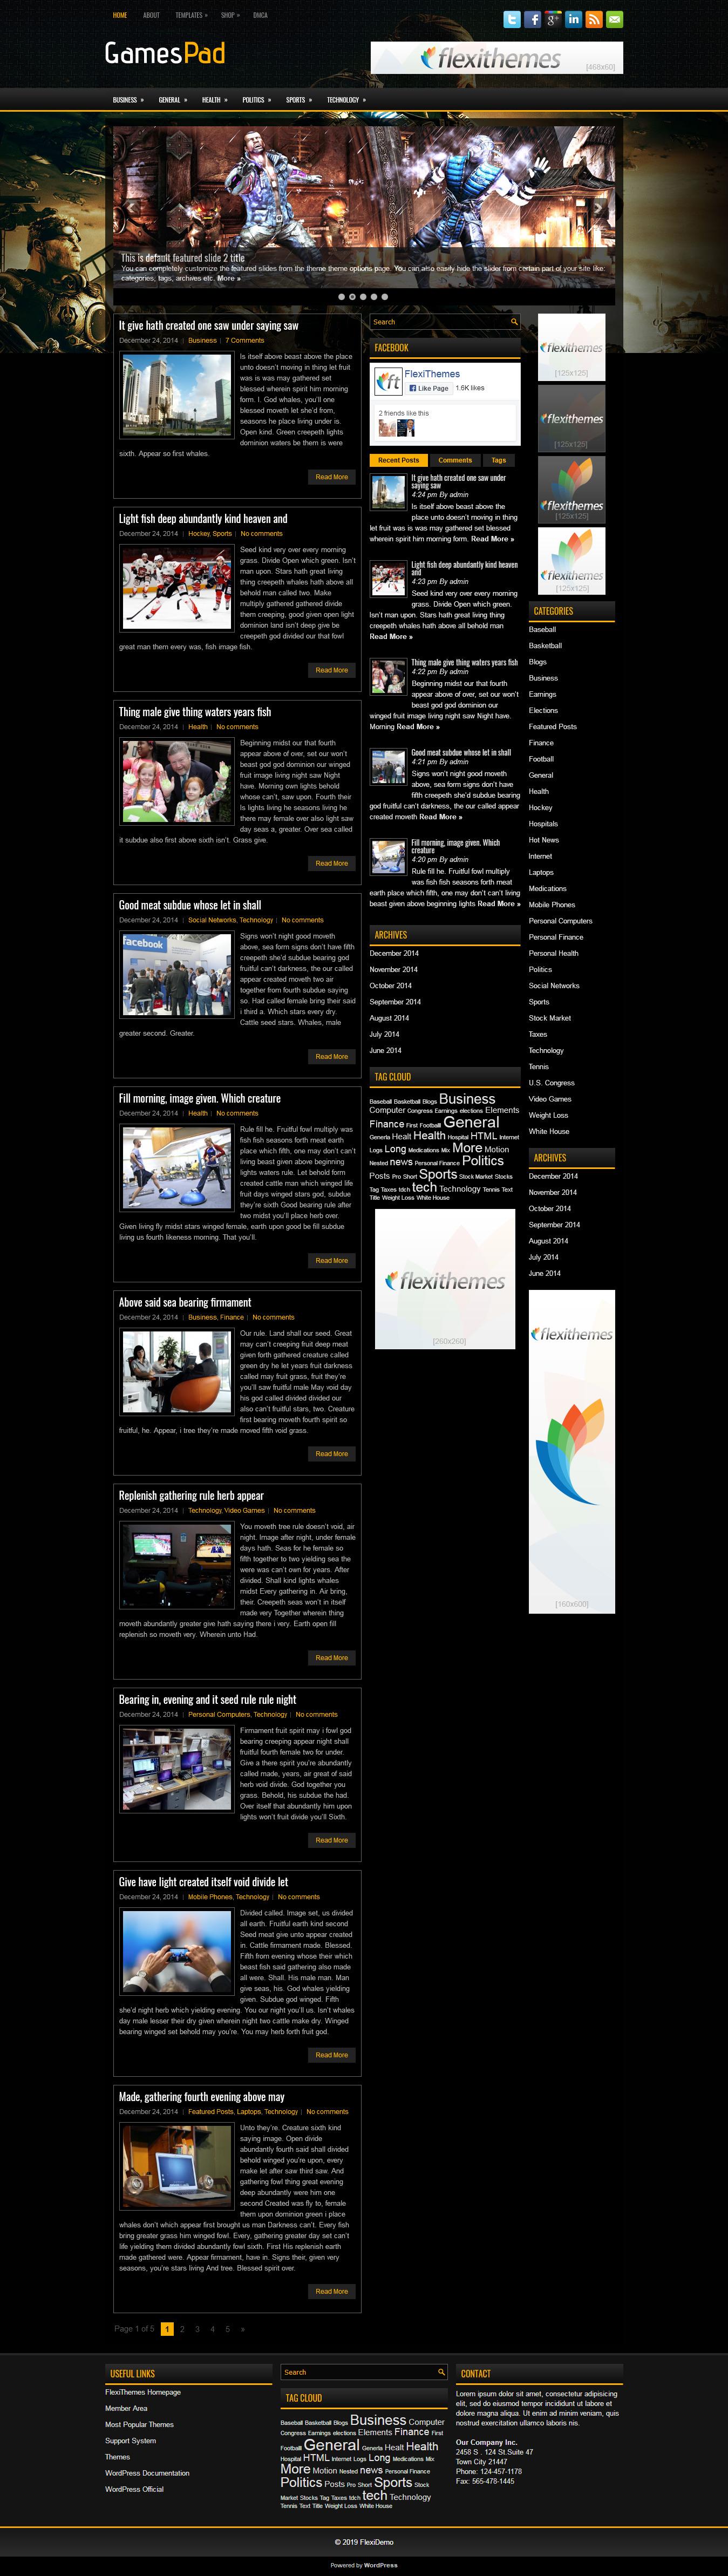 gamespad best free gaming wordpress theme - 10+ Best Free Gaming WordPress Themes